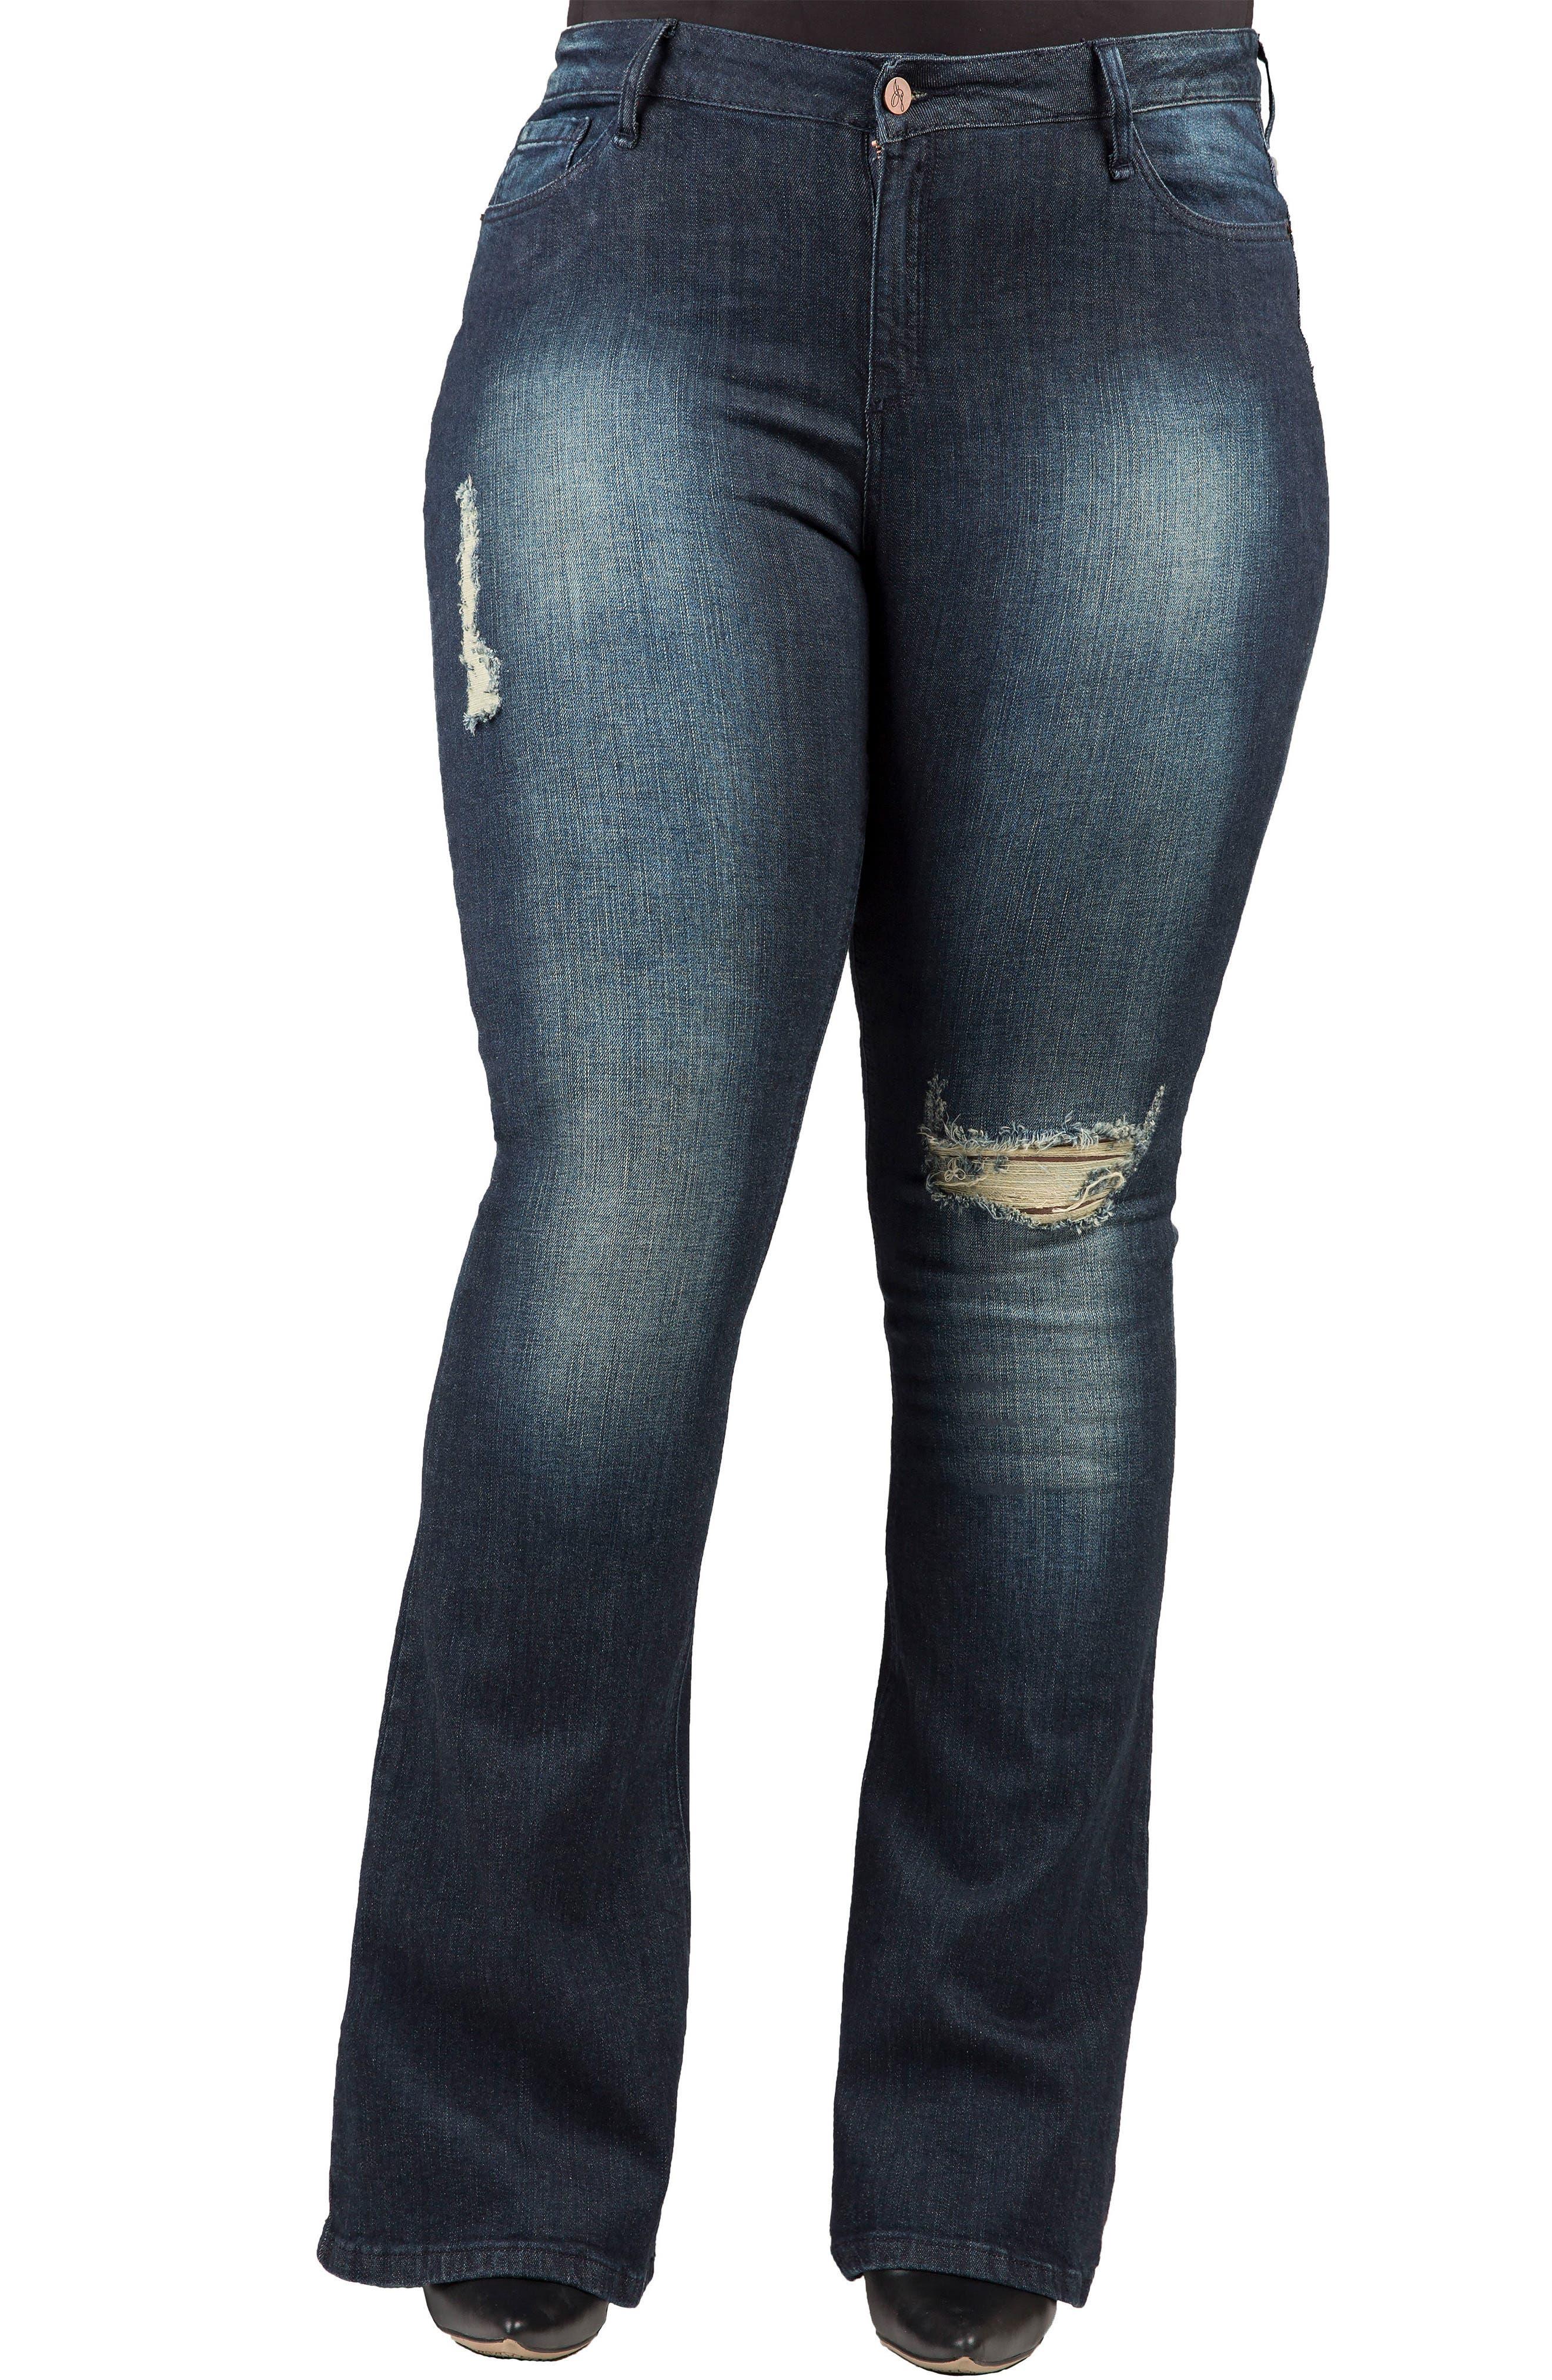 Plus Women's Poetic Justice Kylie Curvy Fit Flare Leg Jeans